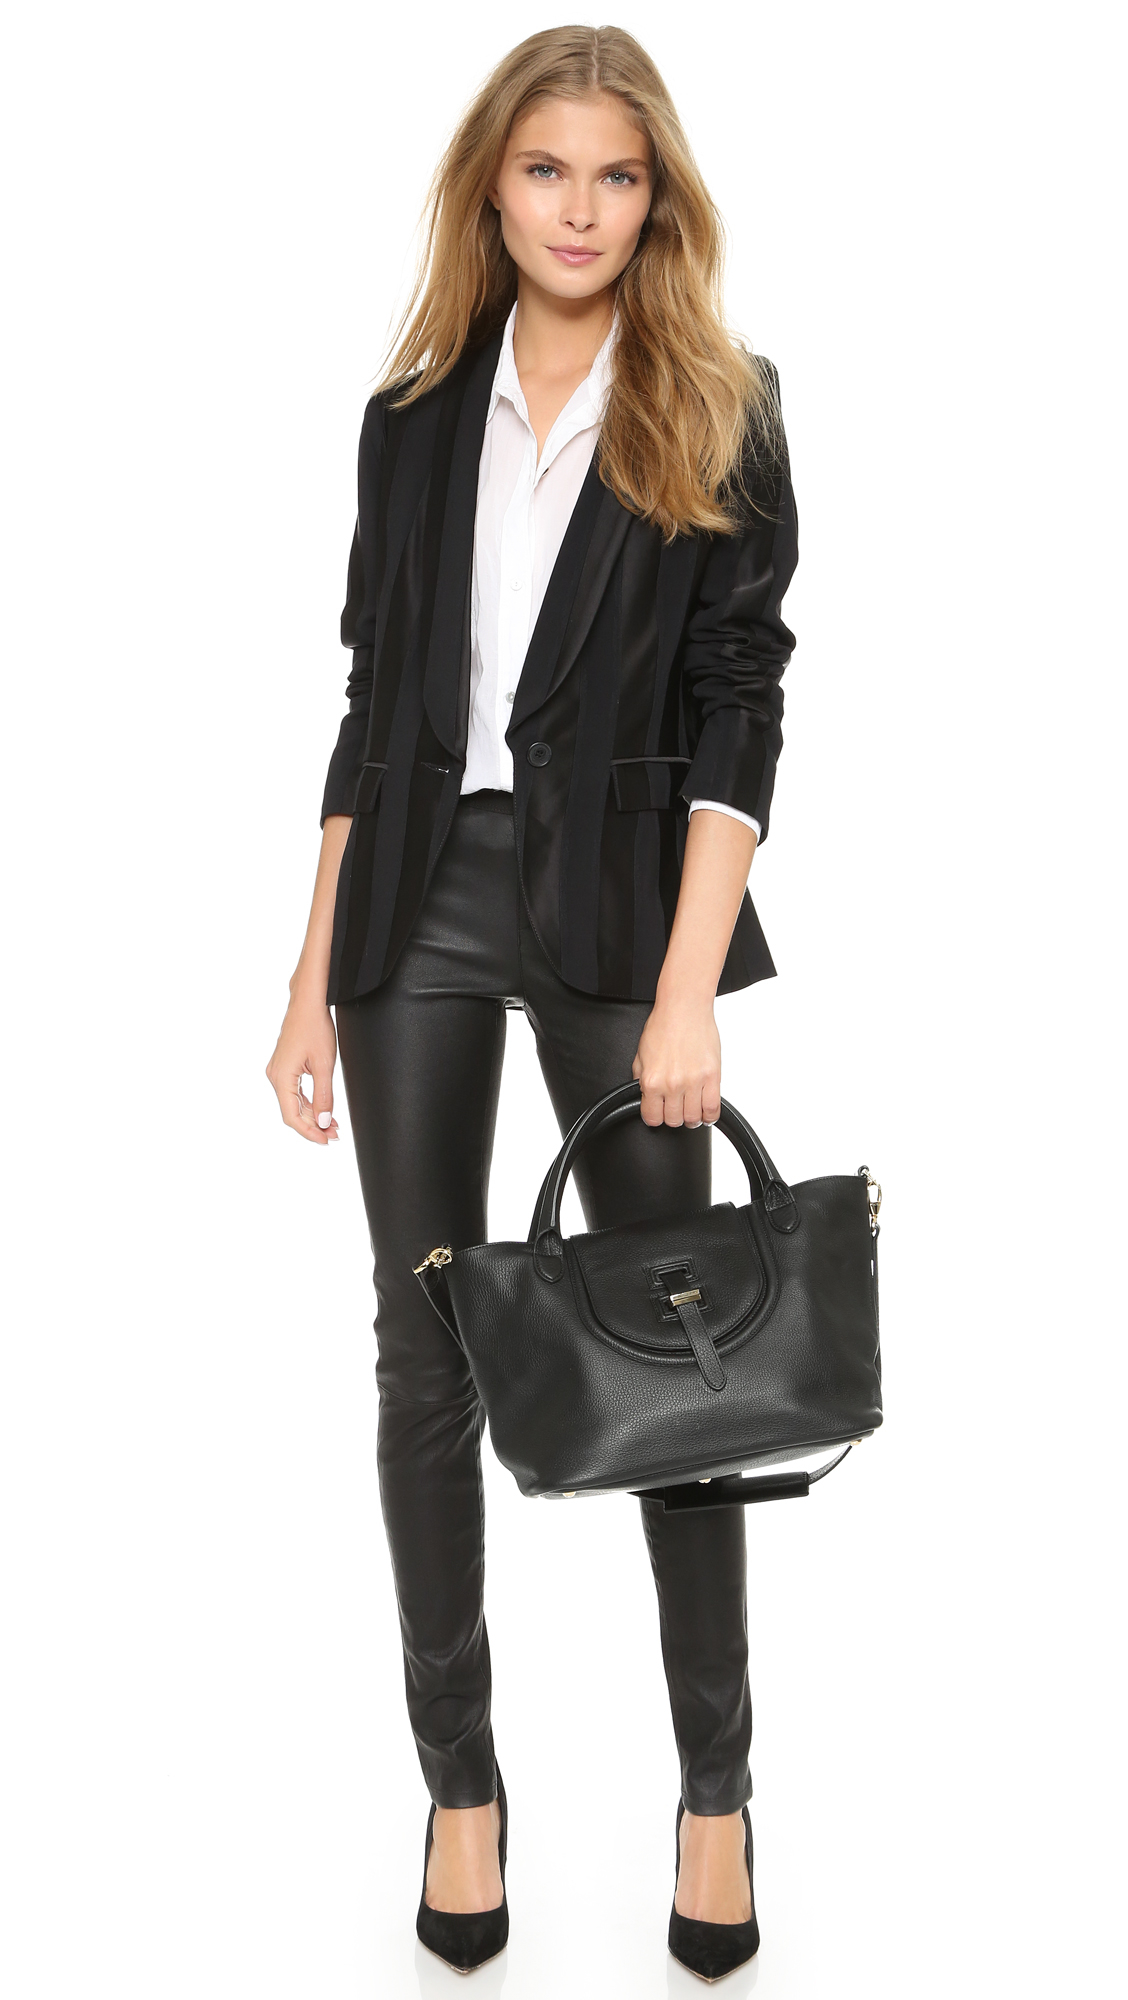 meli melo classic medium thela halo bag in black lyst. Black Bedroom Furniture Sets. Home Design Ideas